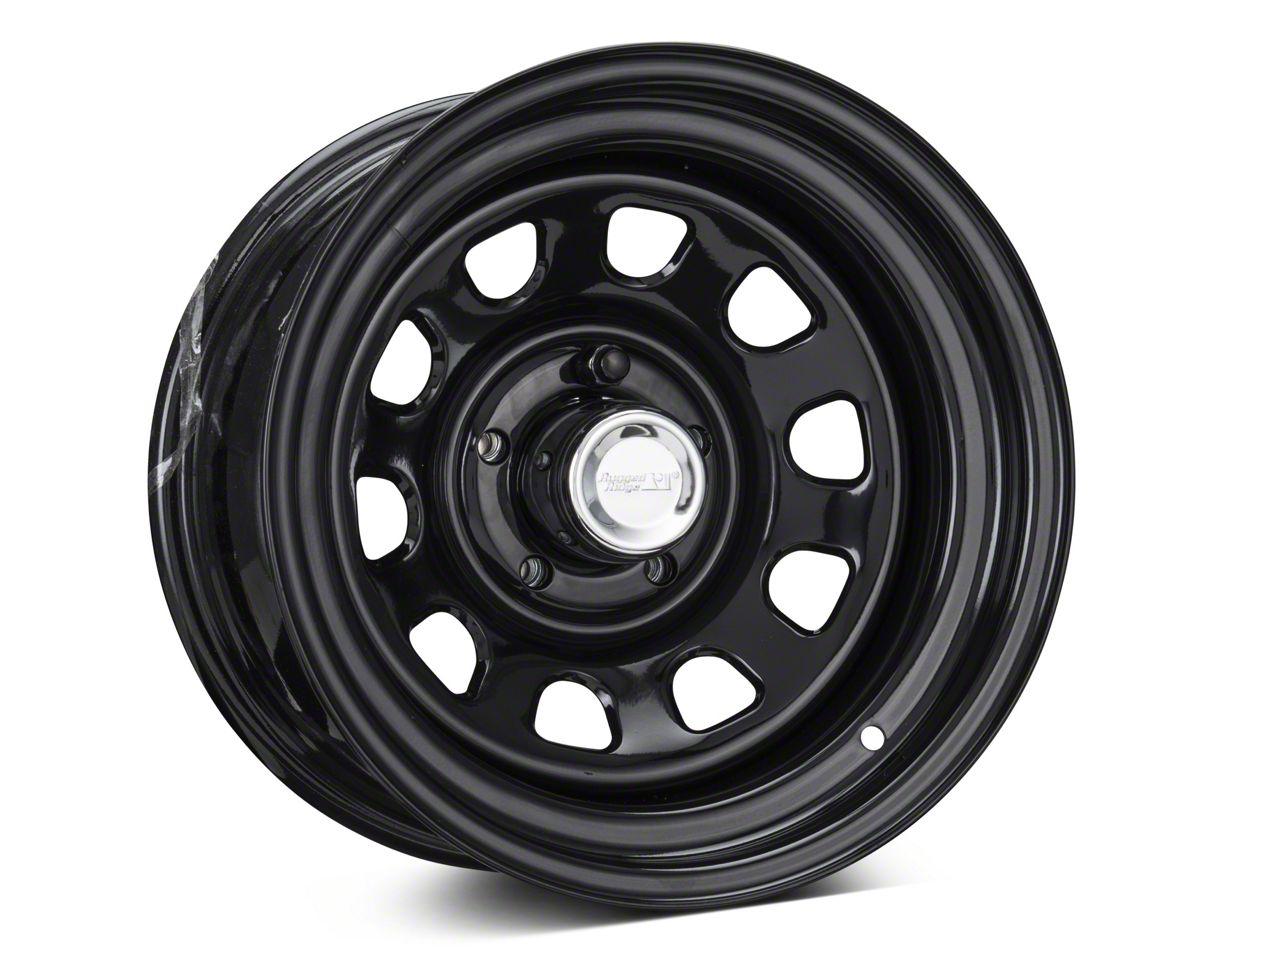 Rugged Ridge D-Window Black Steel Wheel 15x8 Wheel & Mickey Thompson Baja MTZP3 31x10.50R15 Tire Kit (87-06 Jeep Wrangler YJ & TJ)